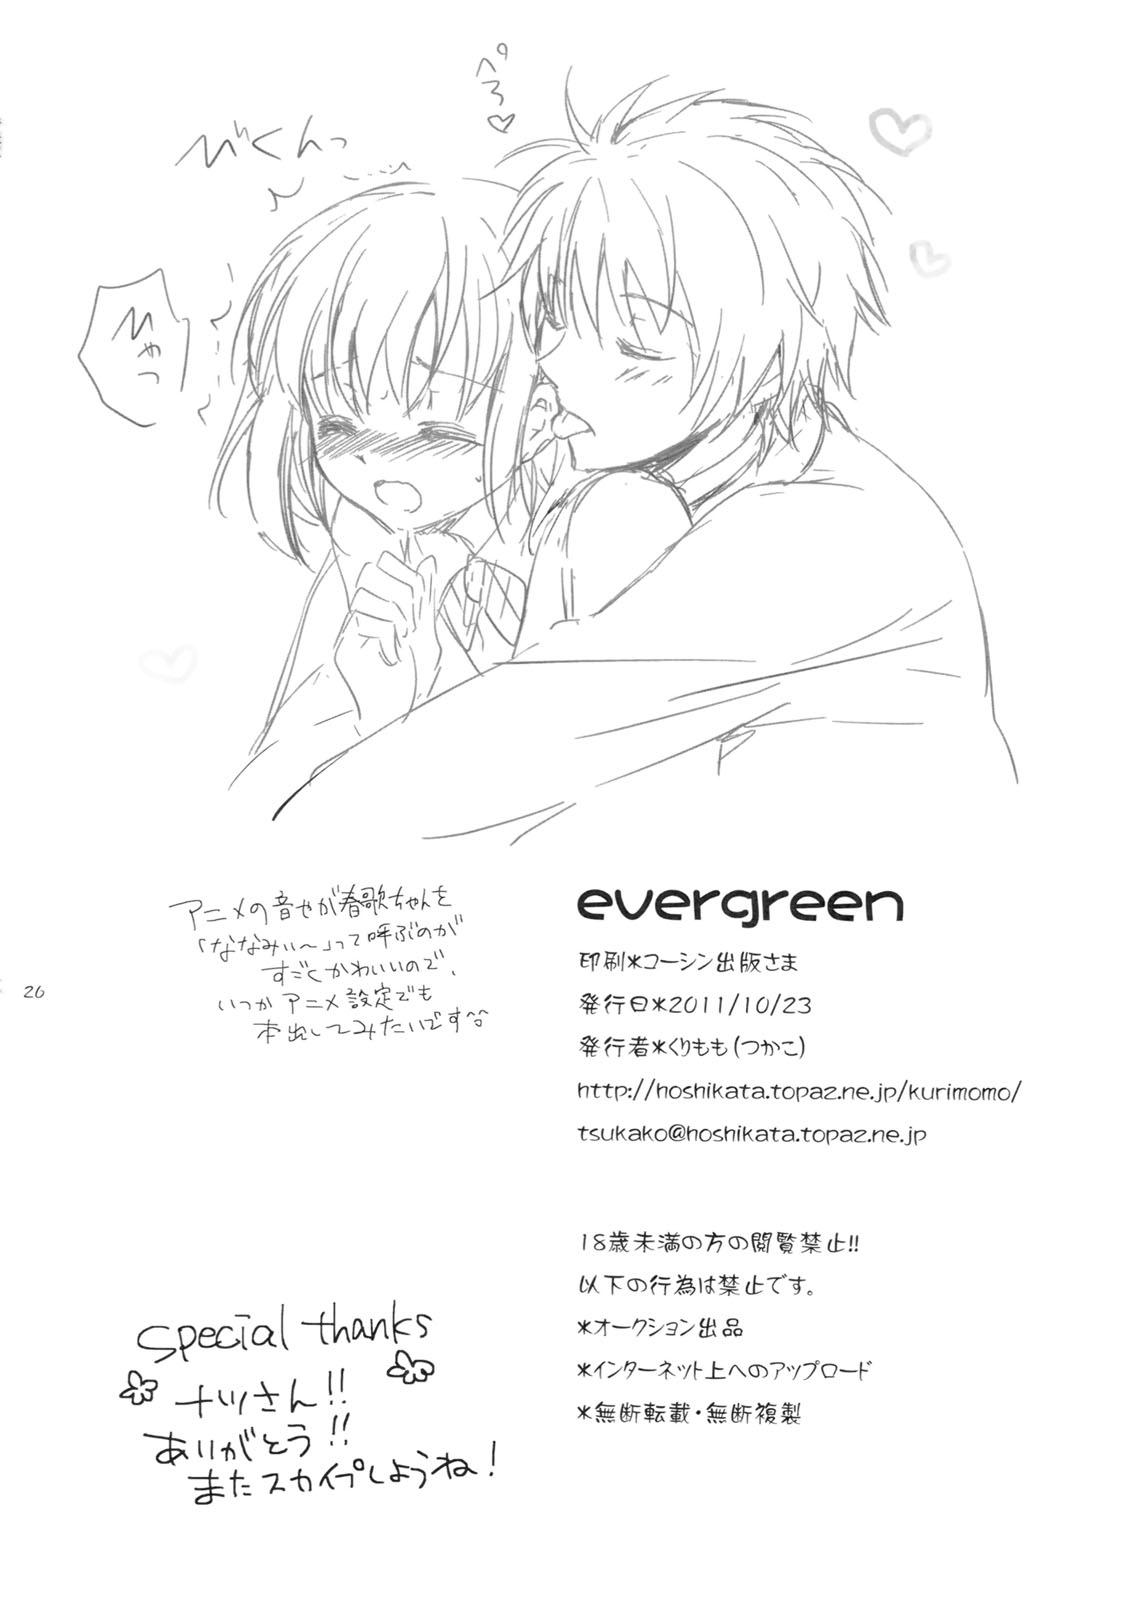 evergreen + Omake 24